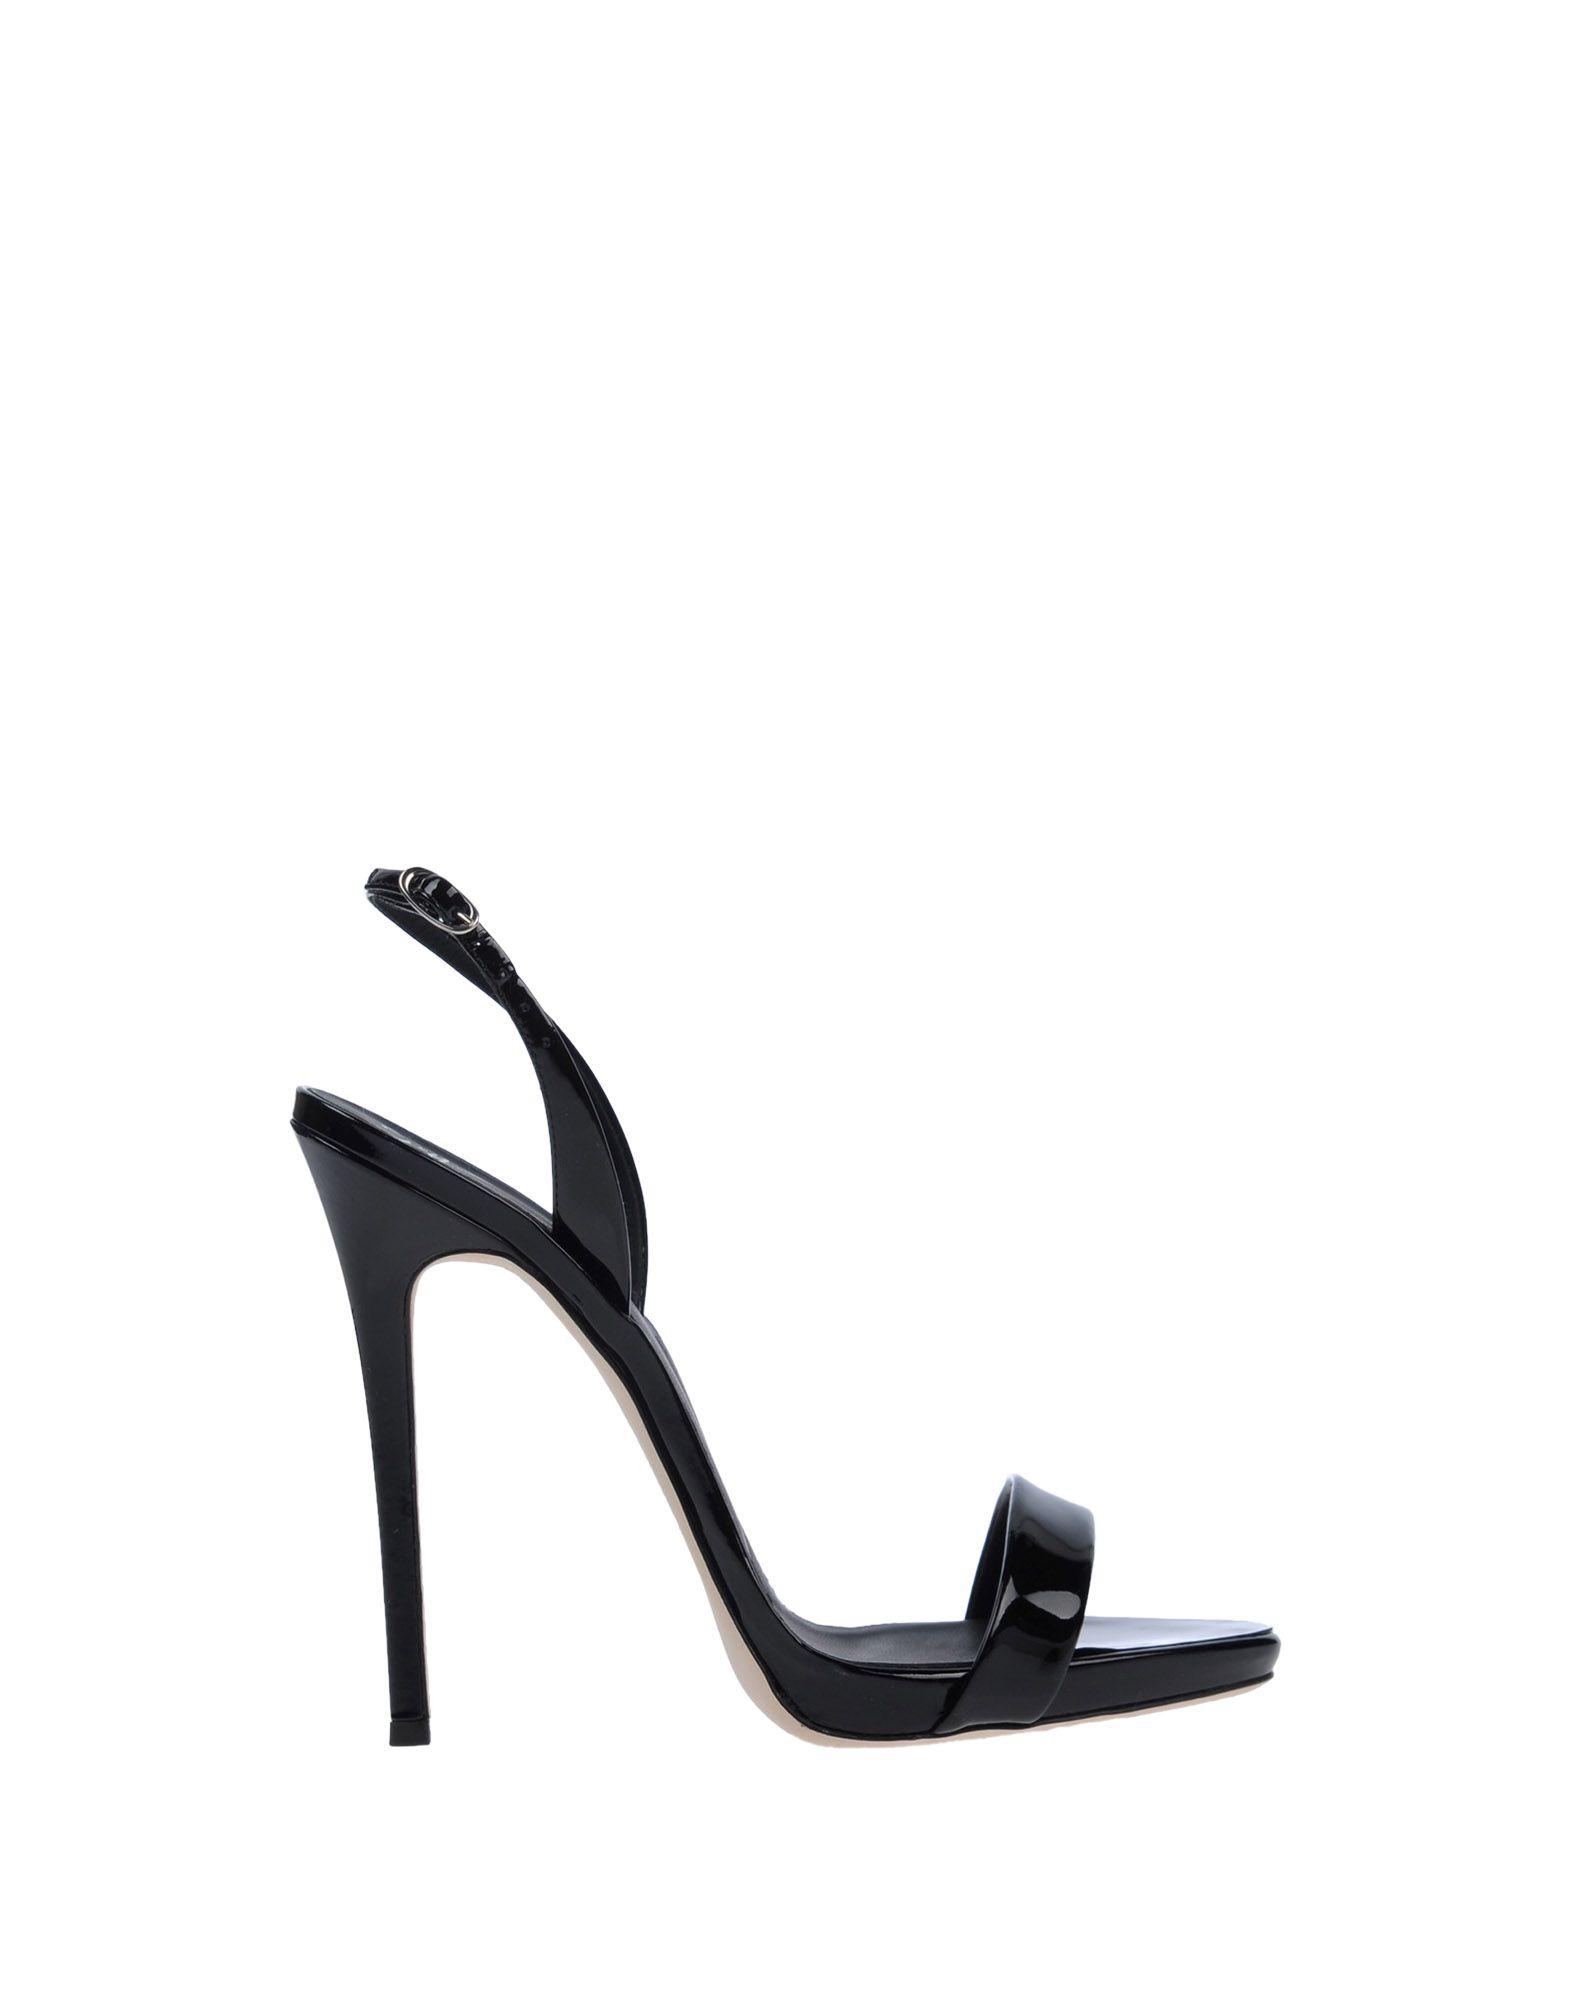 Rabatt Schuhe Sandalen Giuseppe Zanotti Sandalen Schuhe Damen  11502903KN 33db9e